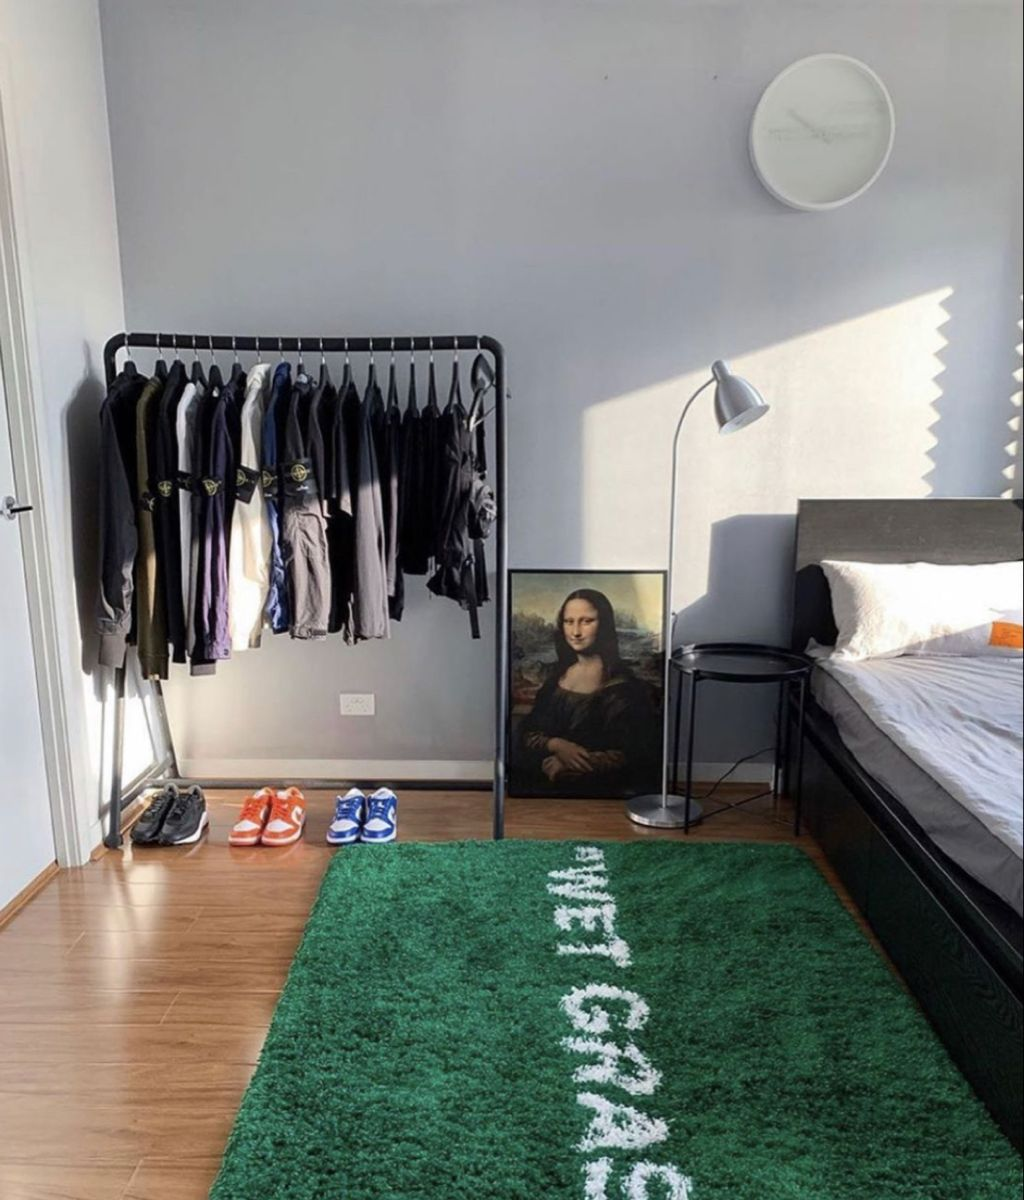 Homelesspenthouse Mens Bedroom Decor Room Design Bedroom Sneakerhead Room